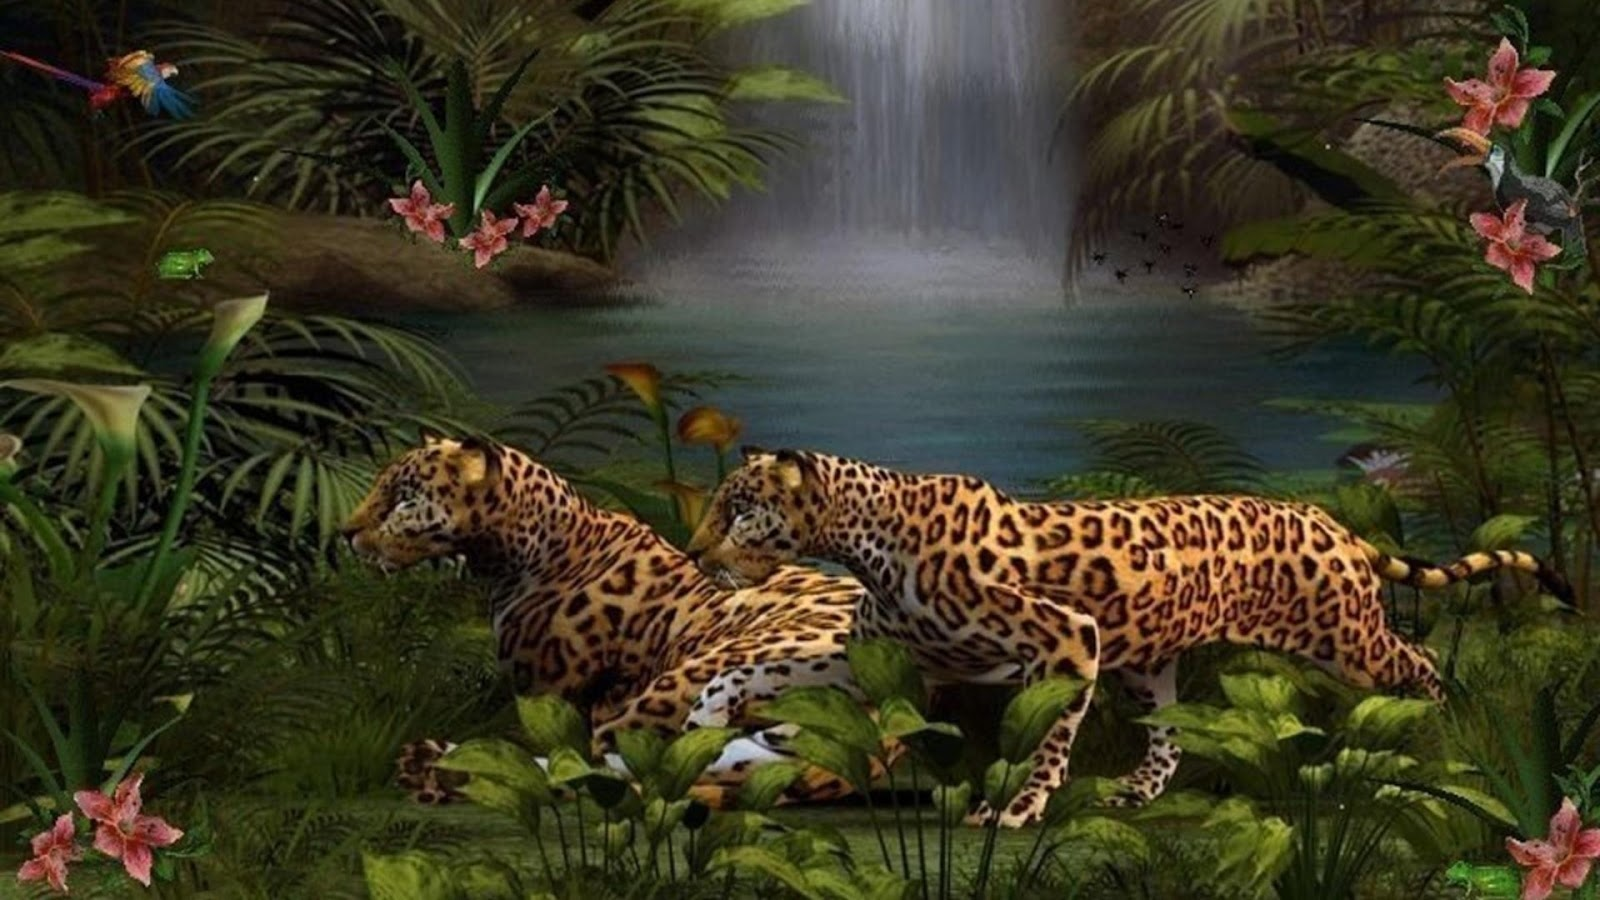 Fondos Animados Para Celular De Animales: Imagenes De Tigres Para Fondo De Pantalla Hd